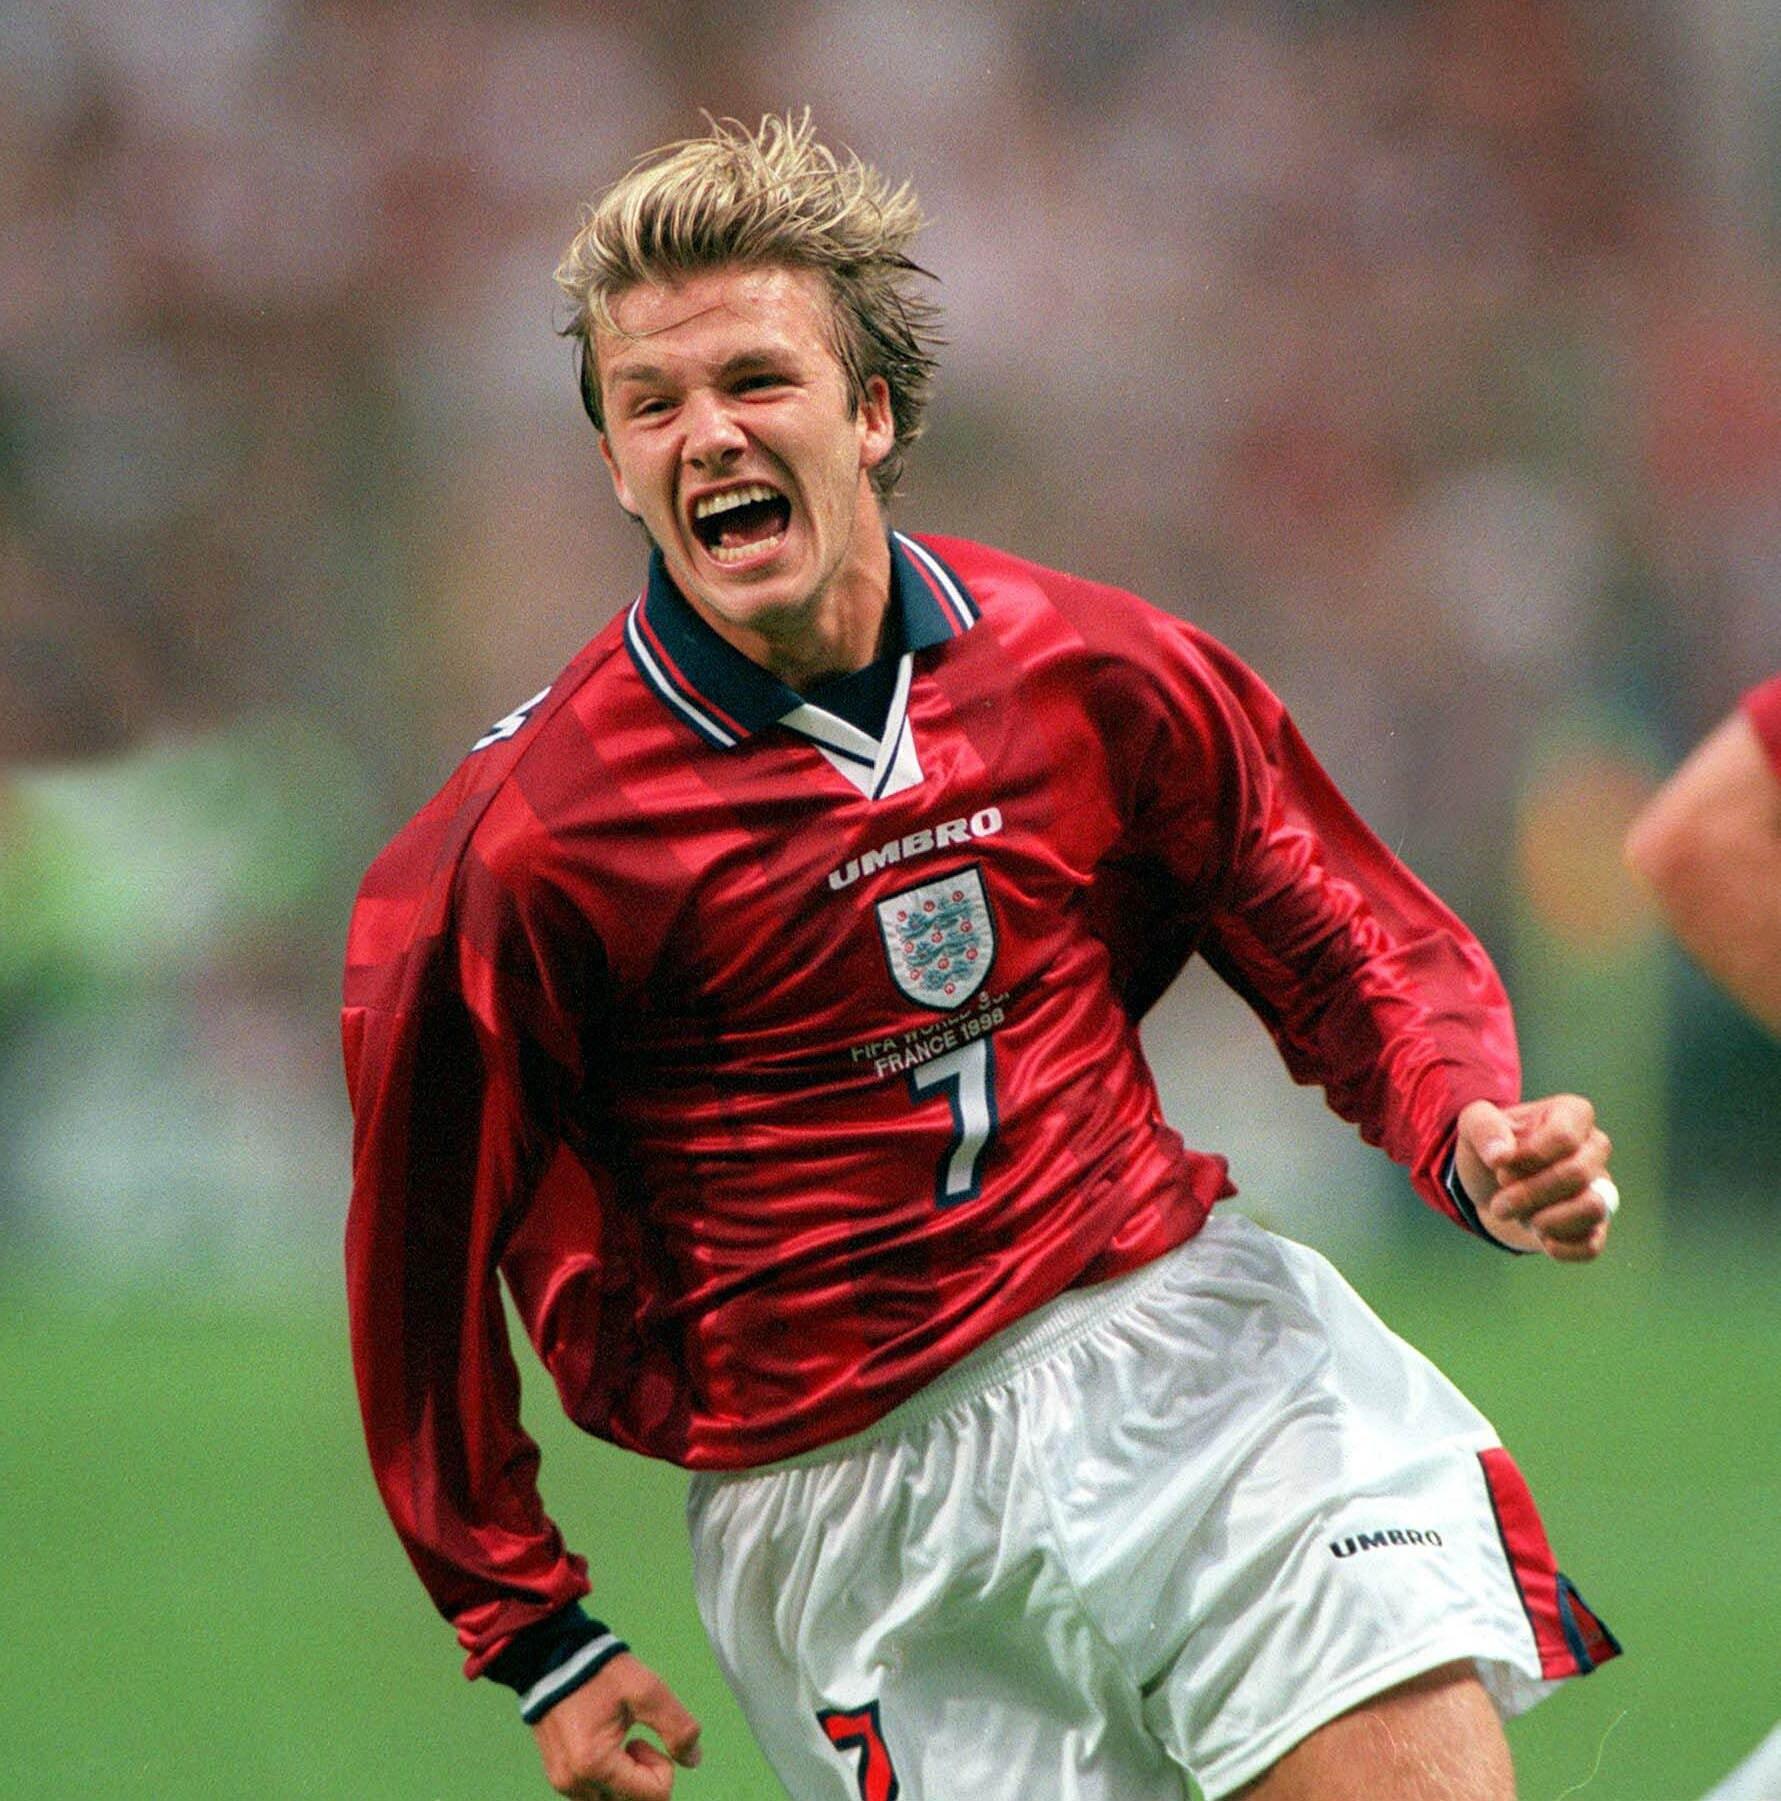 David Beckham celebrates after scoring a goal during the 1998 World Cup Finals in Lens, France.